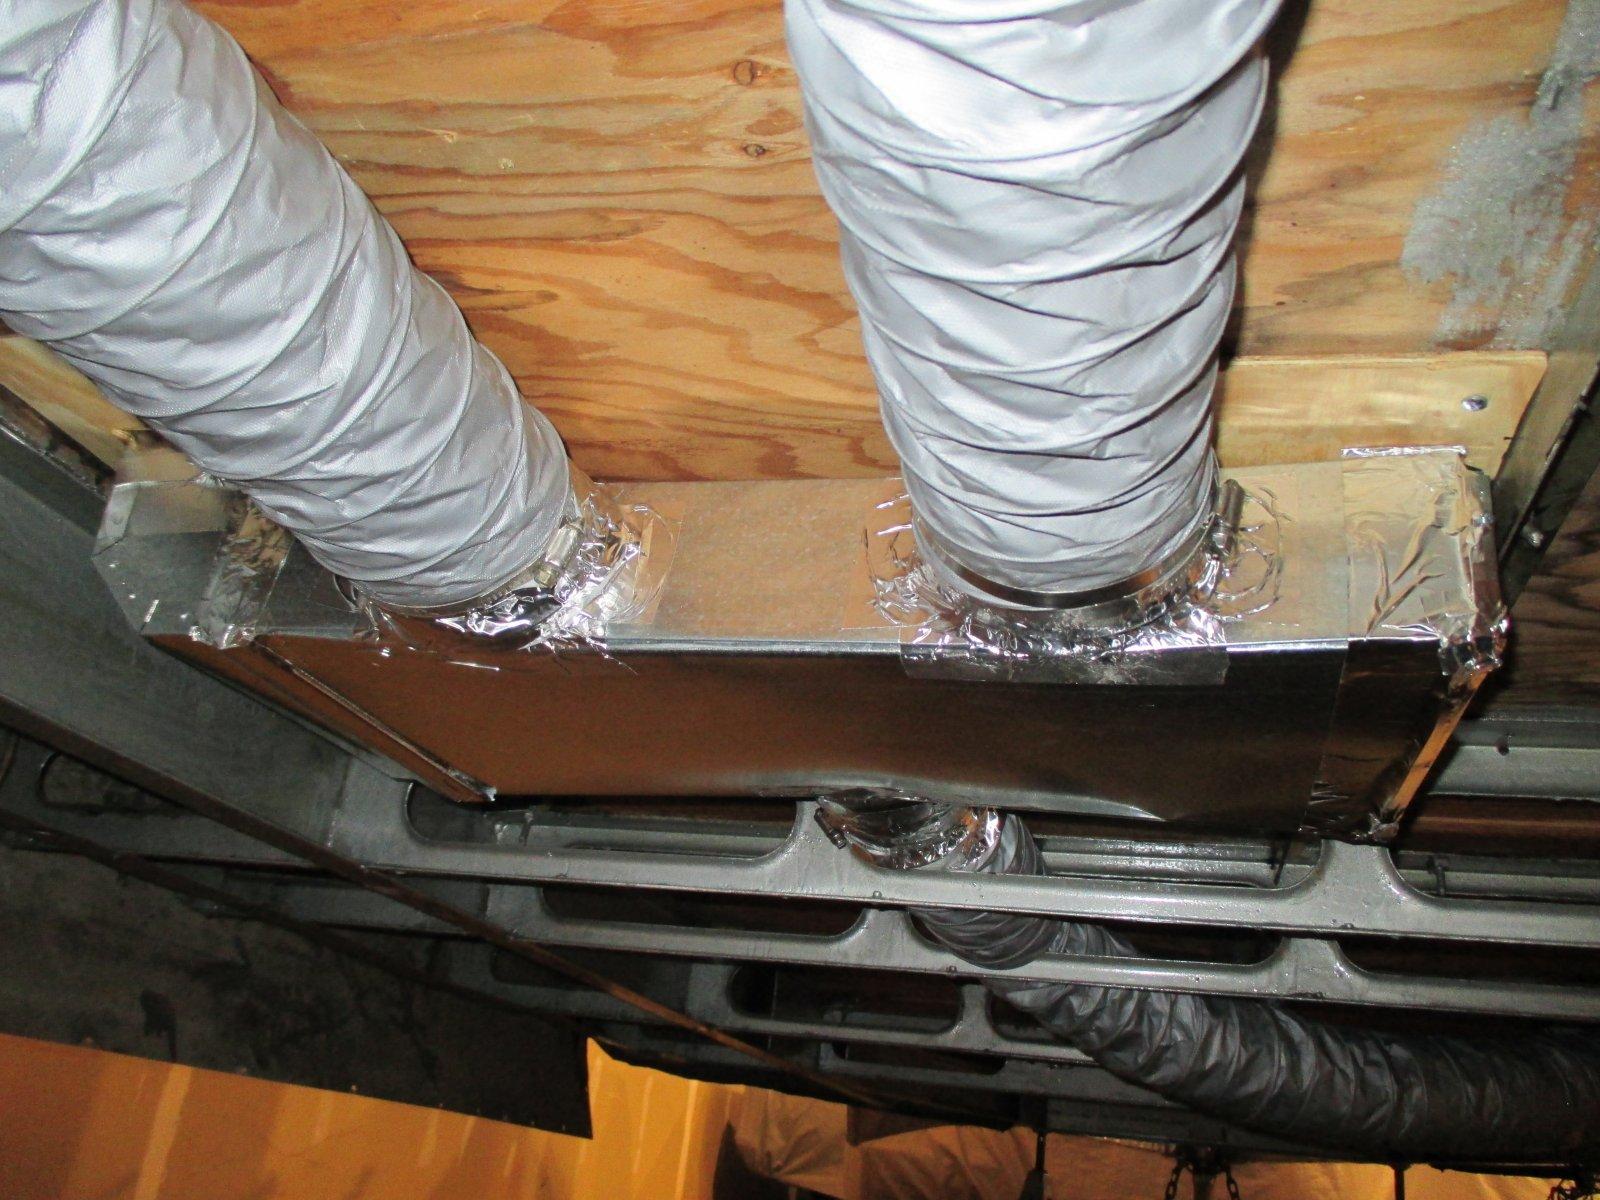 Click image for larger version  Name:1403 Furnace Plenum Under Floor.jpg Views:154 Size:305.9 KB ID:212030